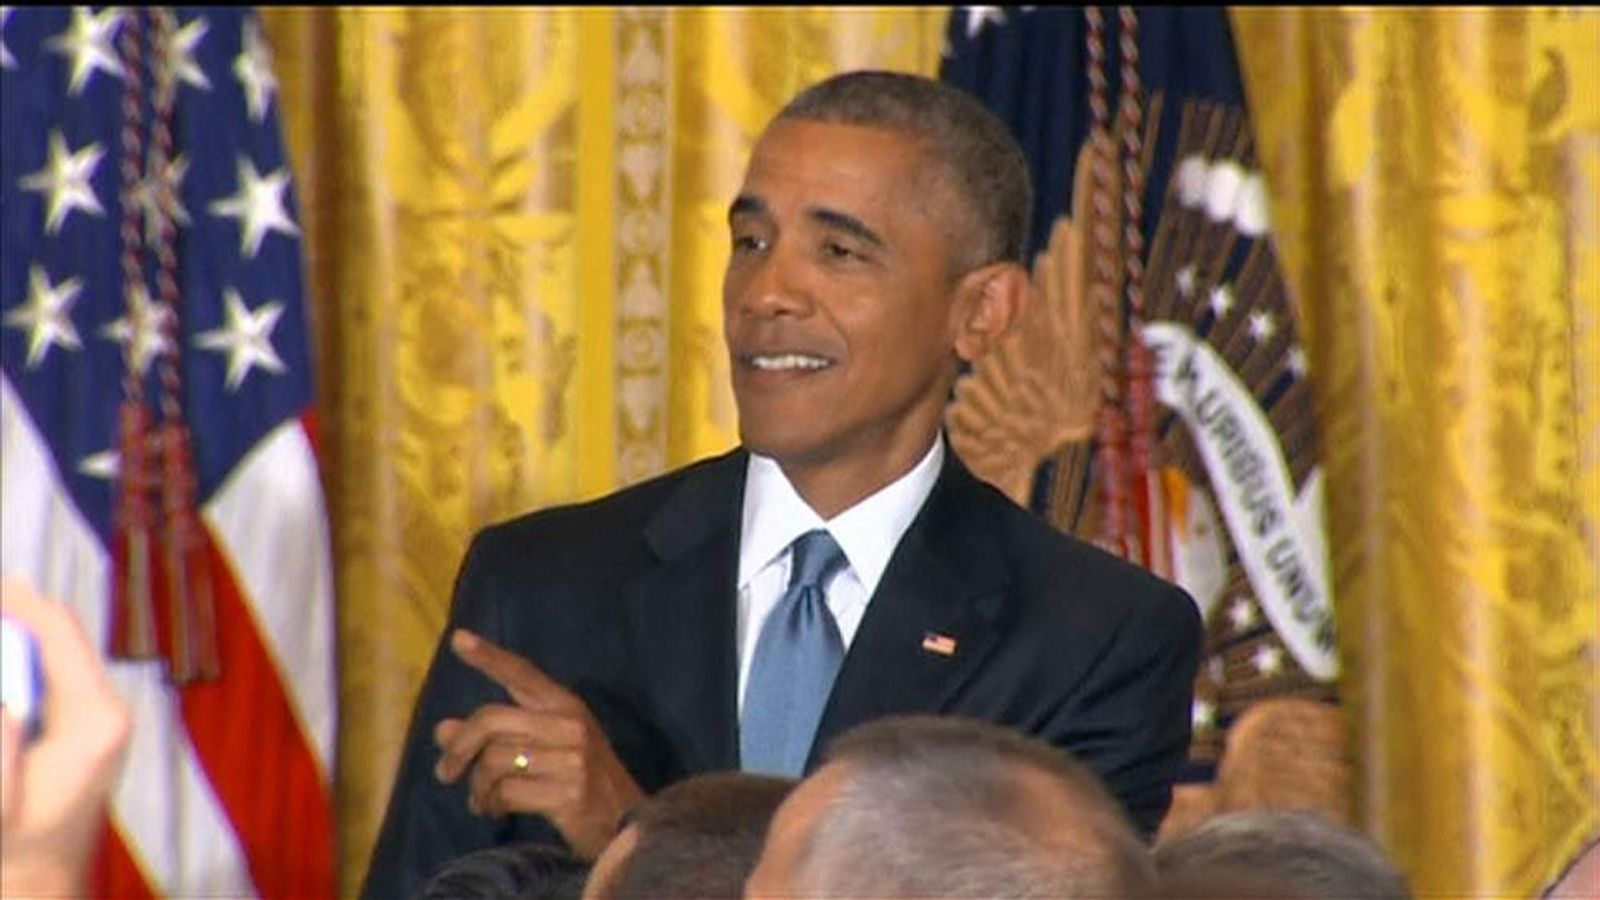 President Obama puts down White House heckler